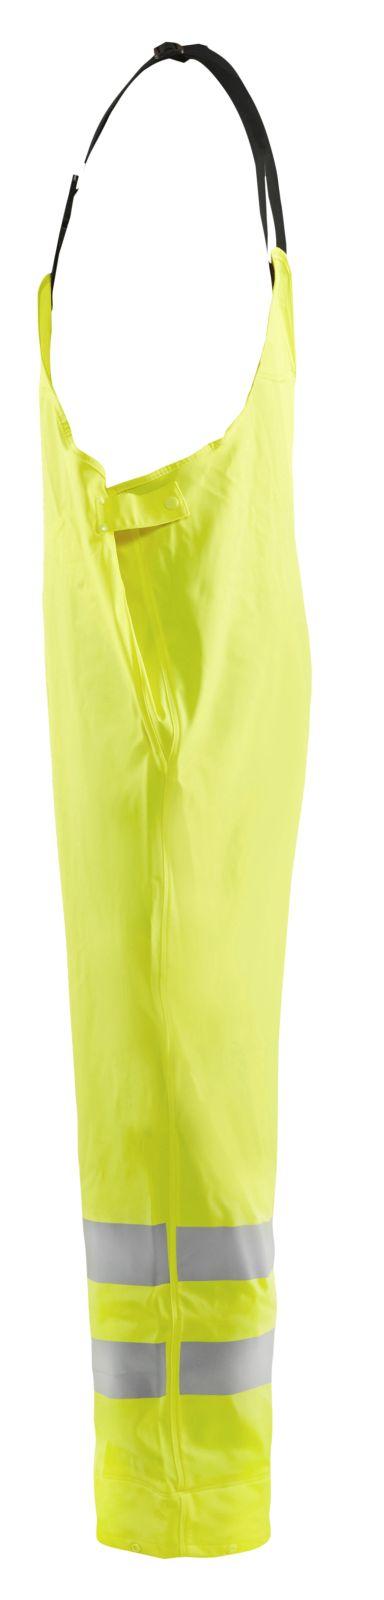 Blaklader Amerikaanse regenoveralls 13862005 High Vis fluo-geel(3300)